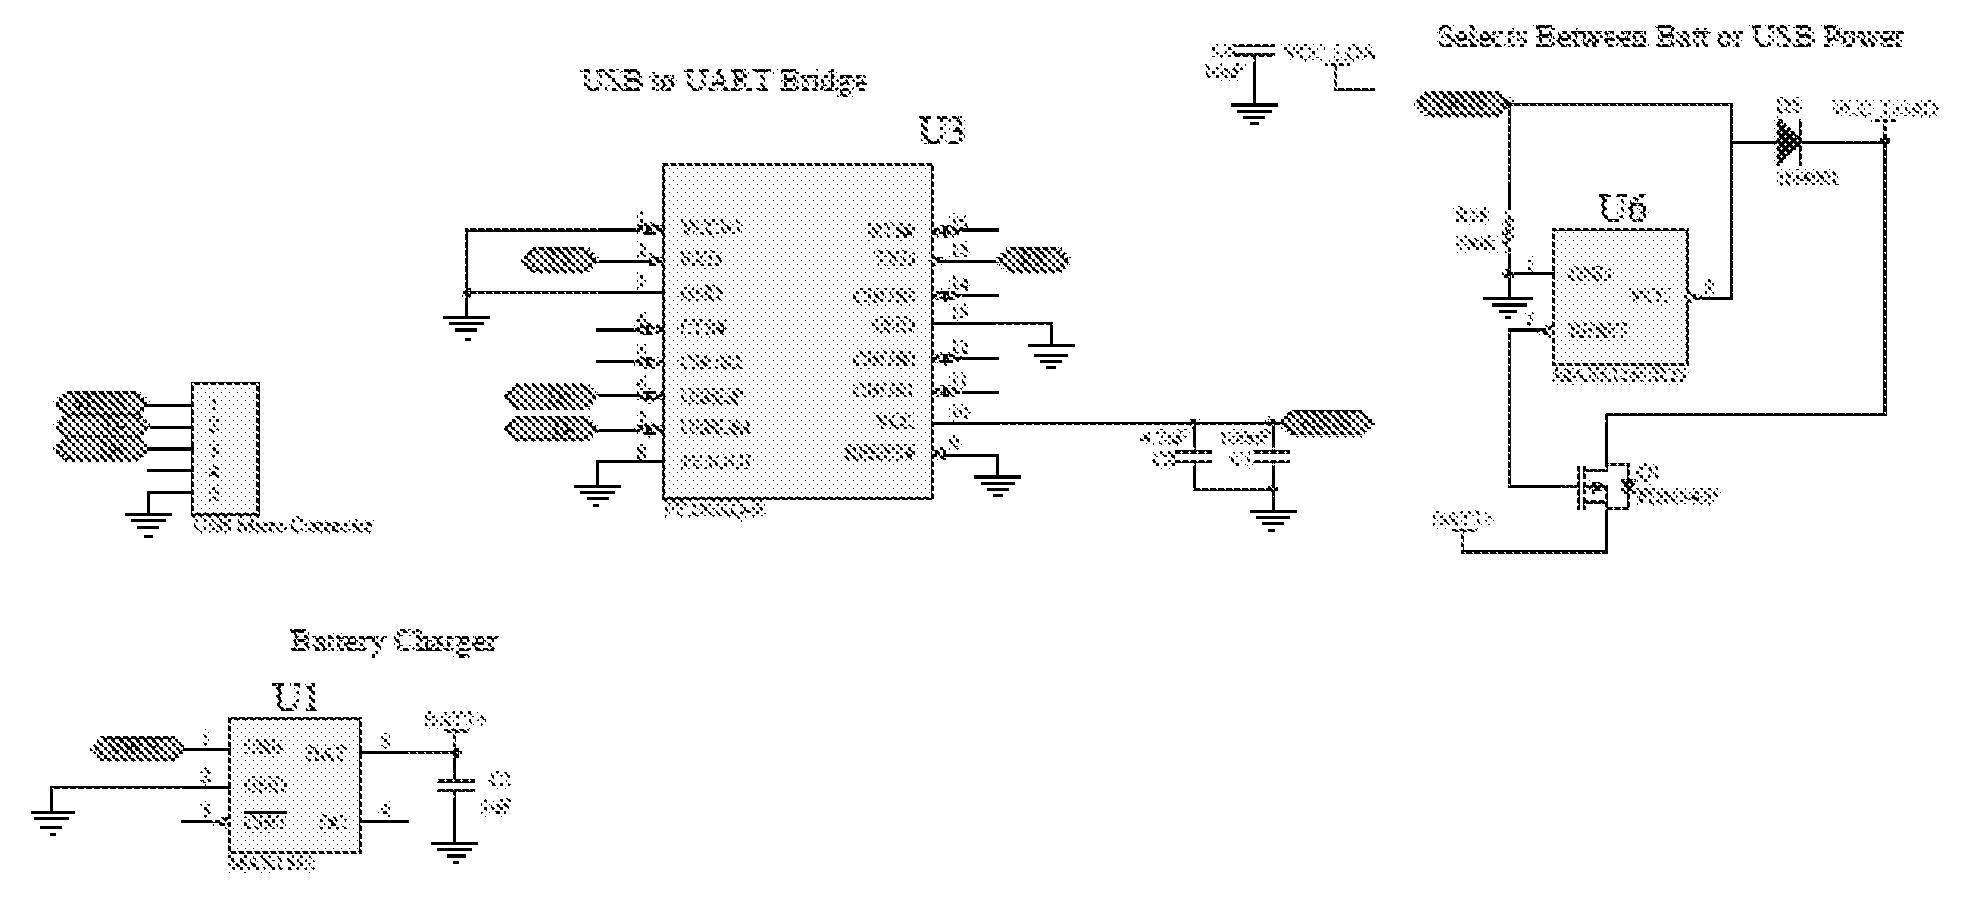 hight resolution of e cig schematic powerking co basic flashlight diagram basic flashlight diagram